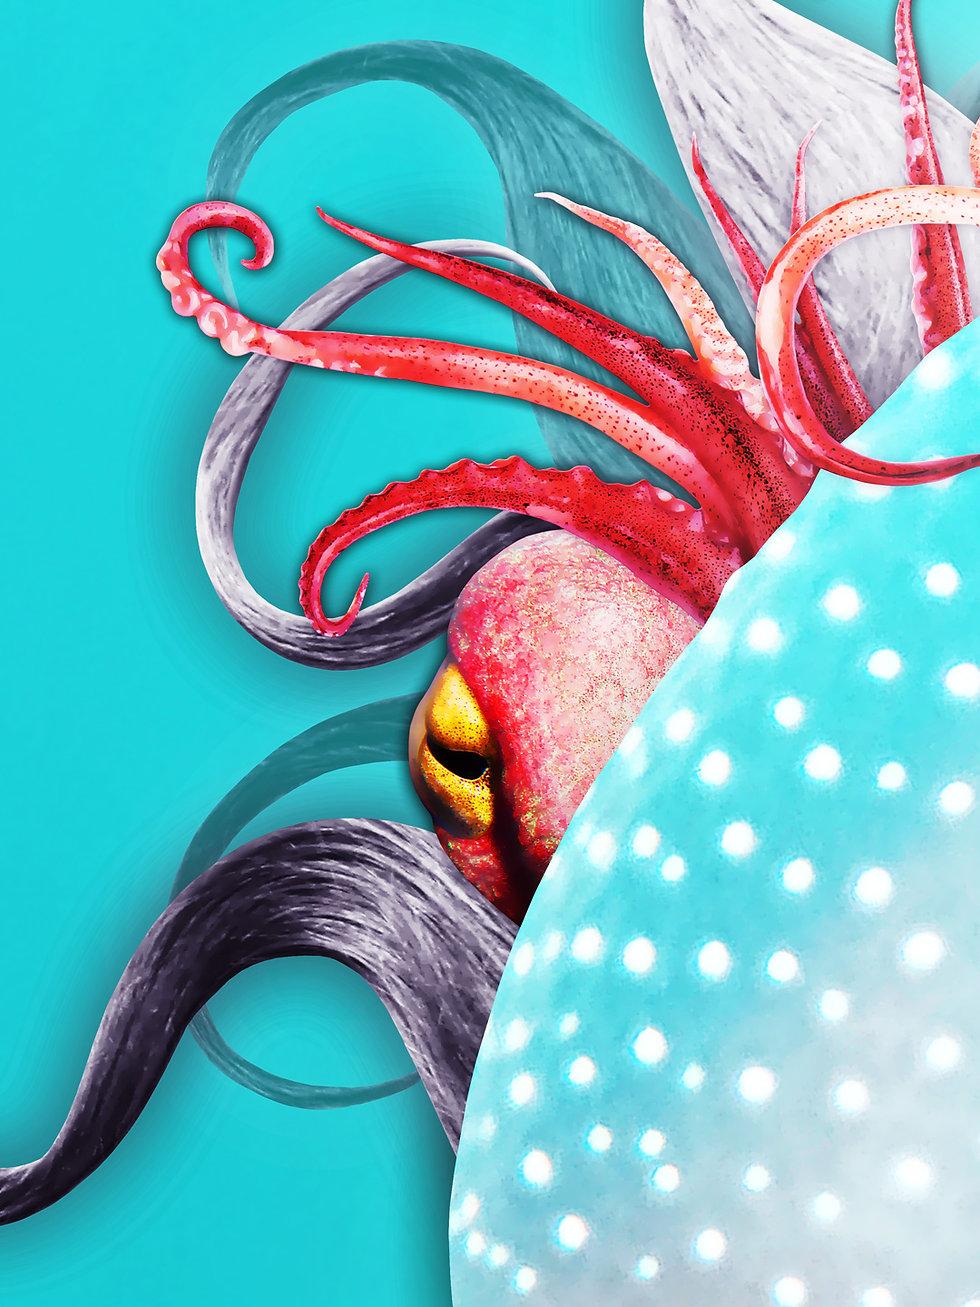 Jellyfish_Octopus_artwork_2.jpg